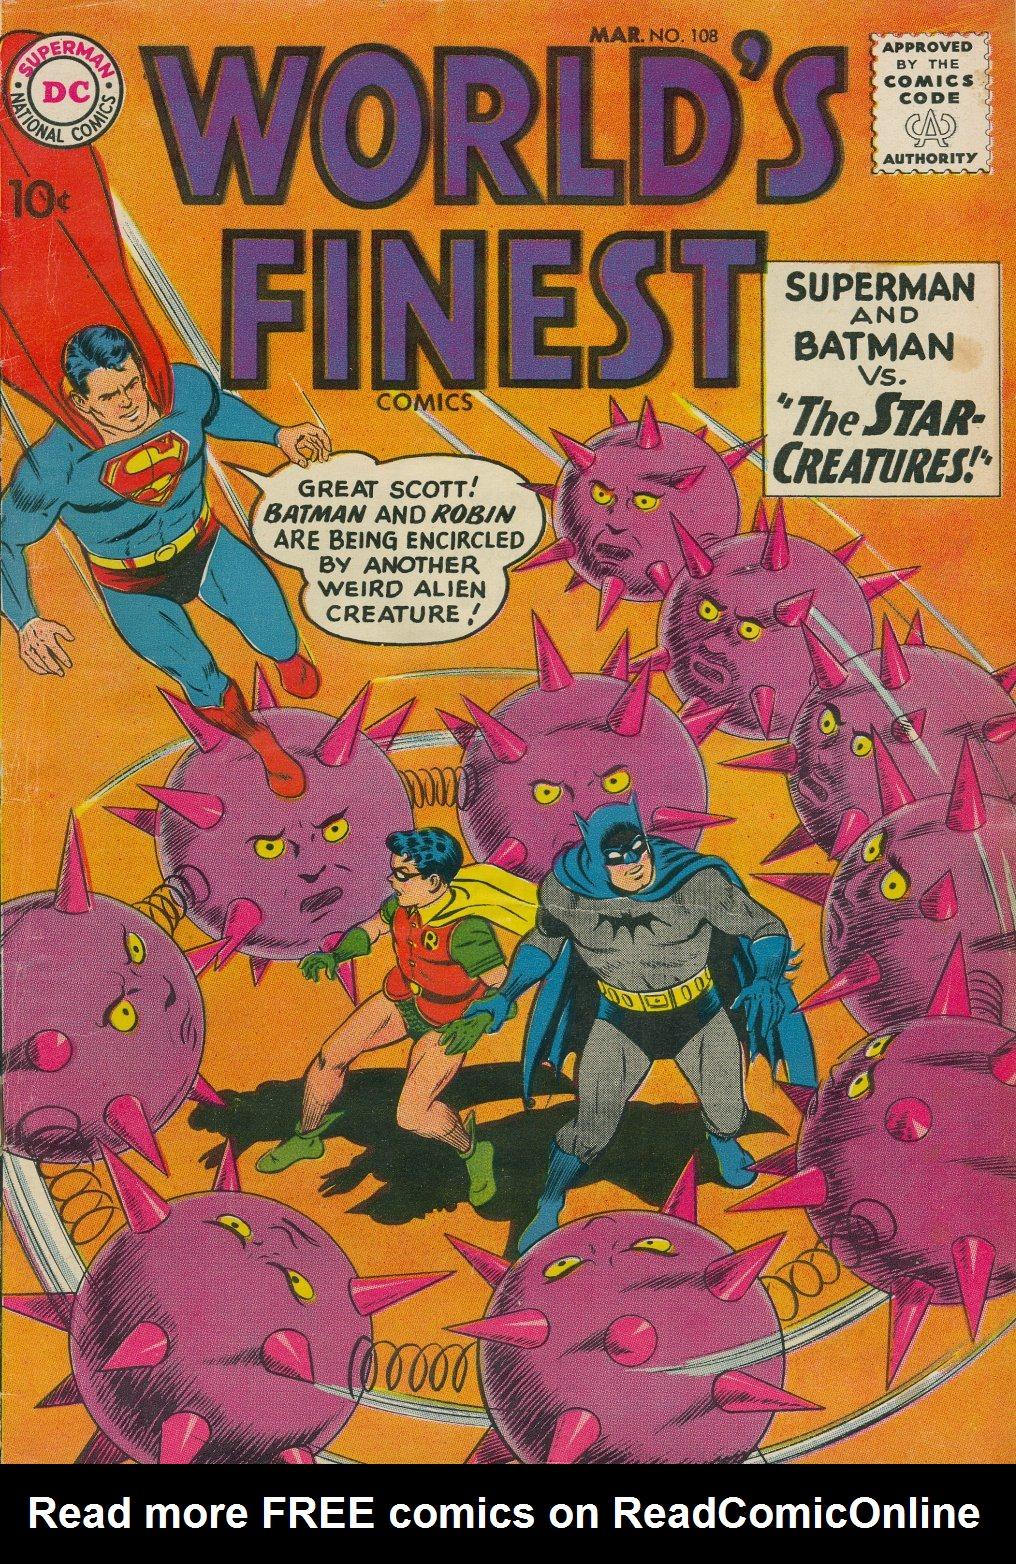 Read online World's Finest Comics comic -  Issue #108 - 1